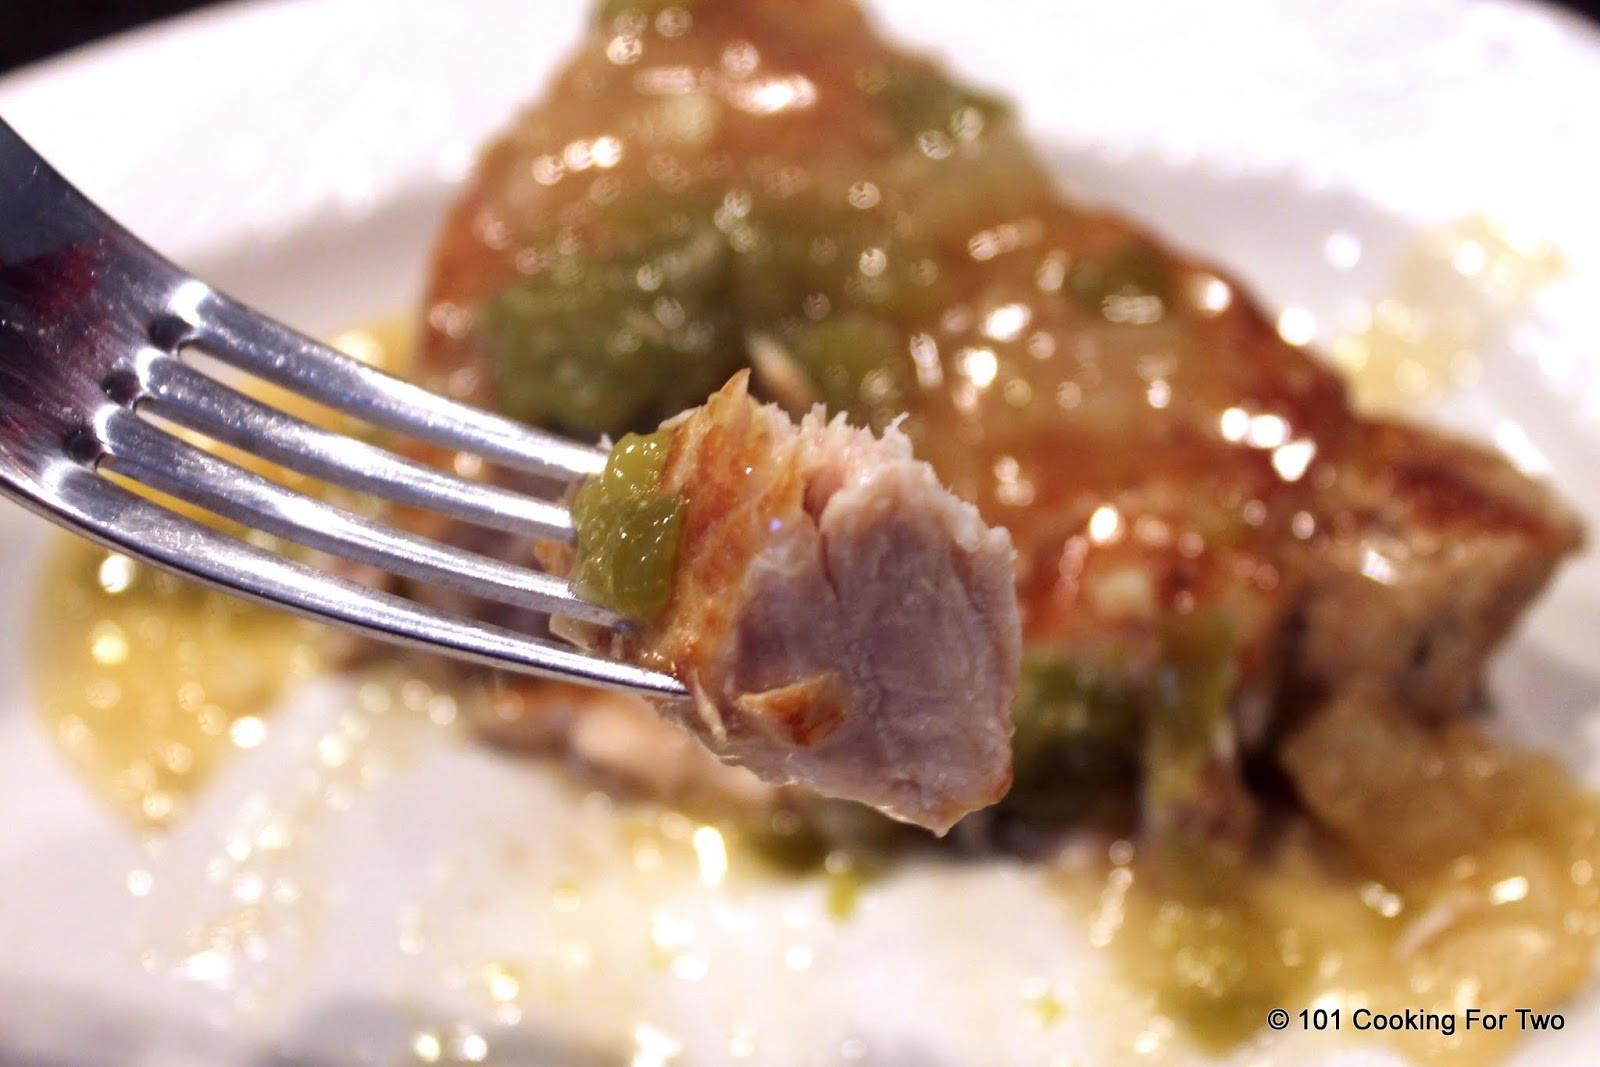 Fall Apart Pork Chops  Easy Crock Pot Pork Chops with Gravy